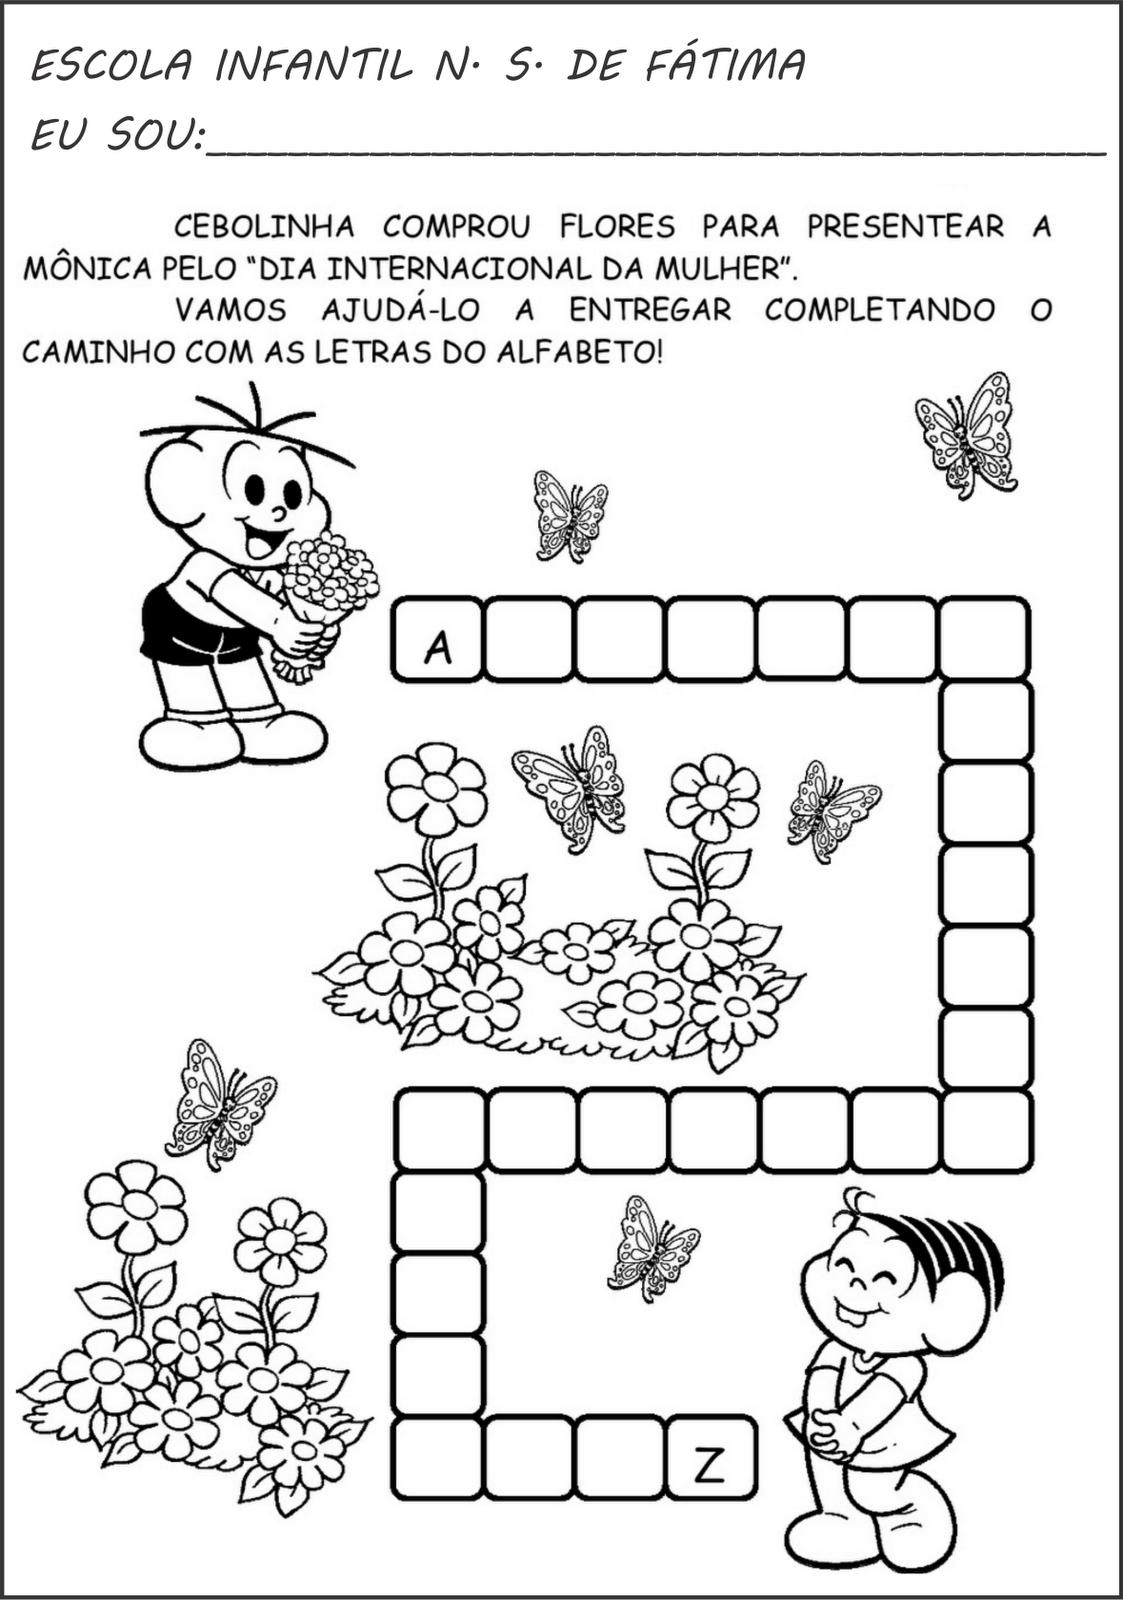 Favoritos Confira dicas de atividades escolares do ALFABETO | Na Internet QN65